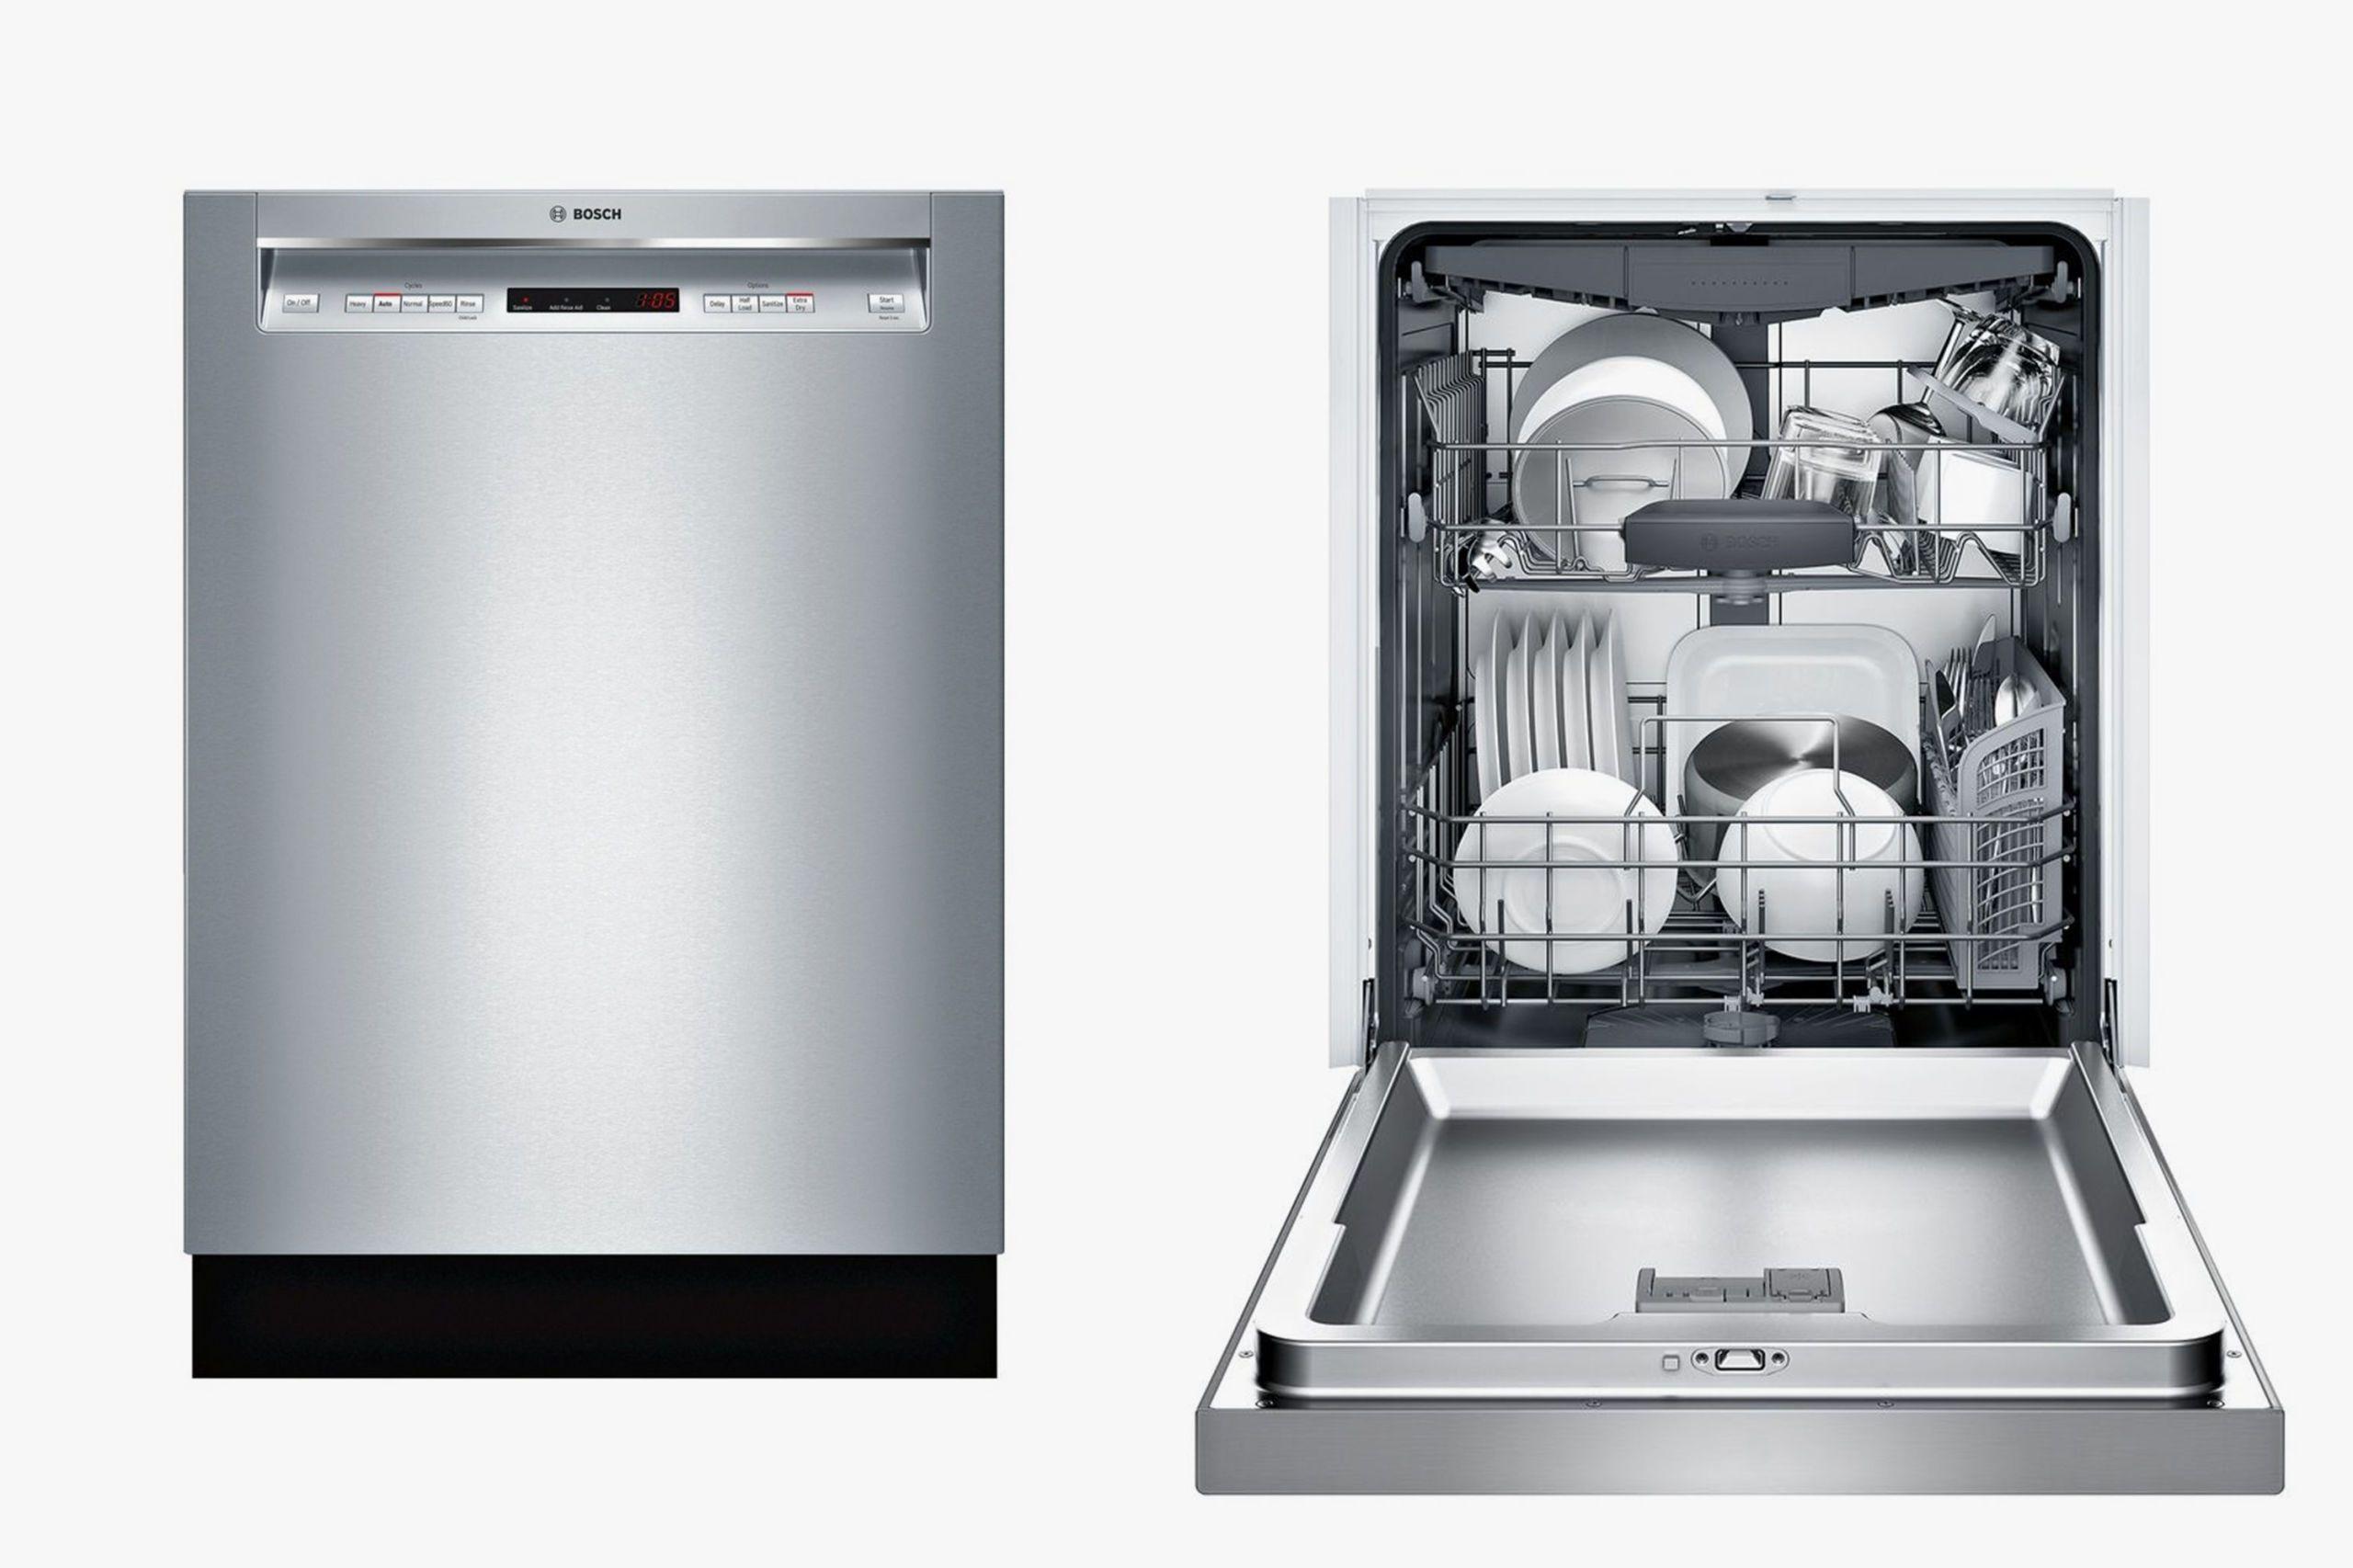 Bosch Dishwasher Life Expectancy Tyres2c